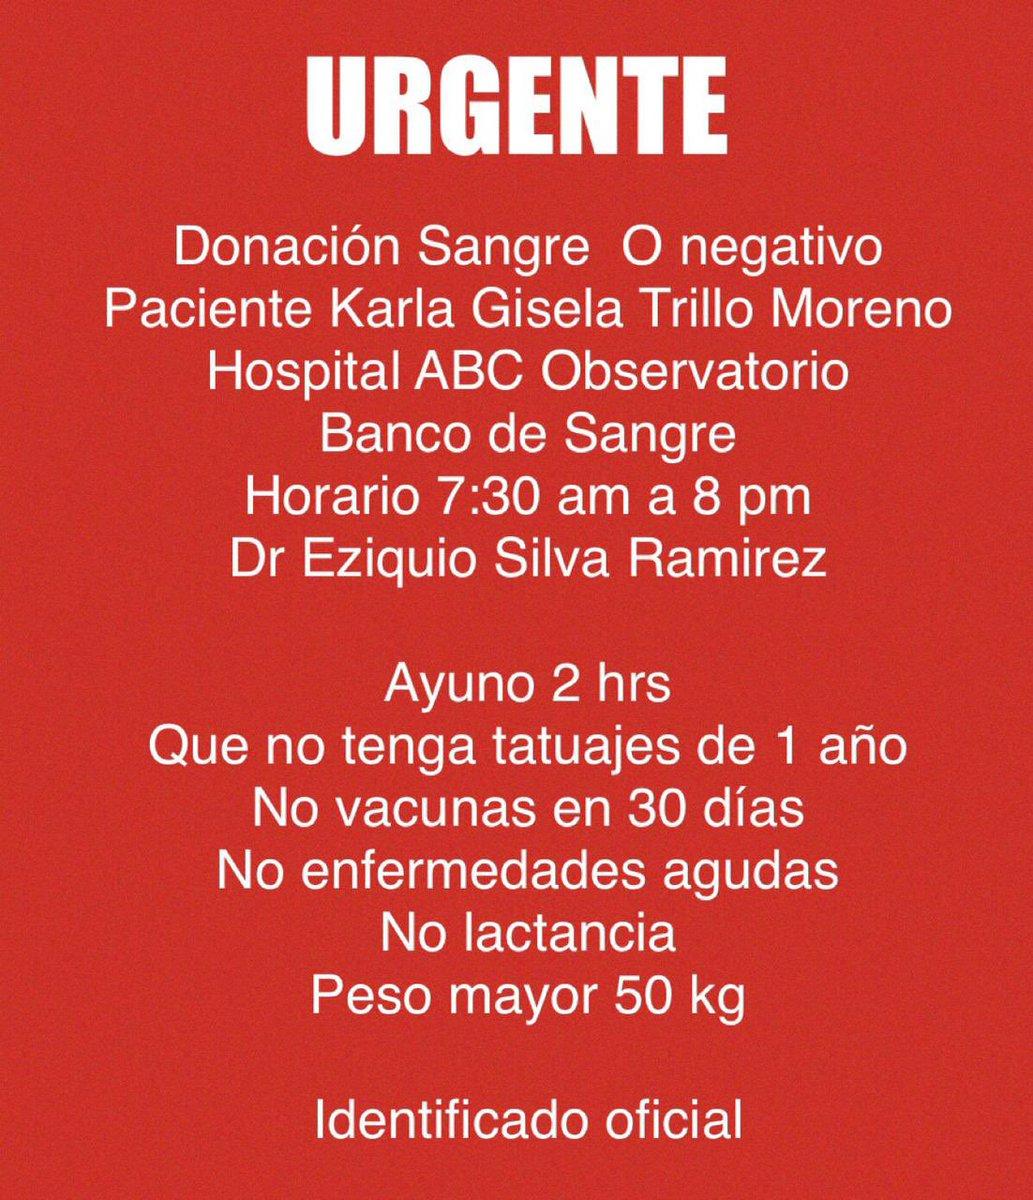 #dona #onegativo #sangre